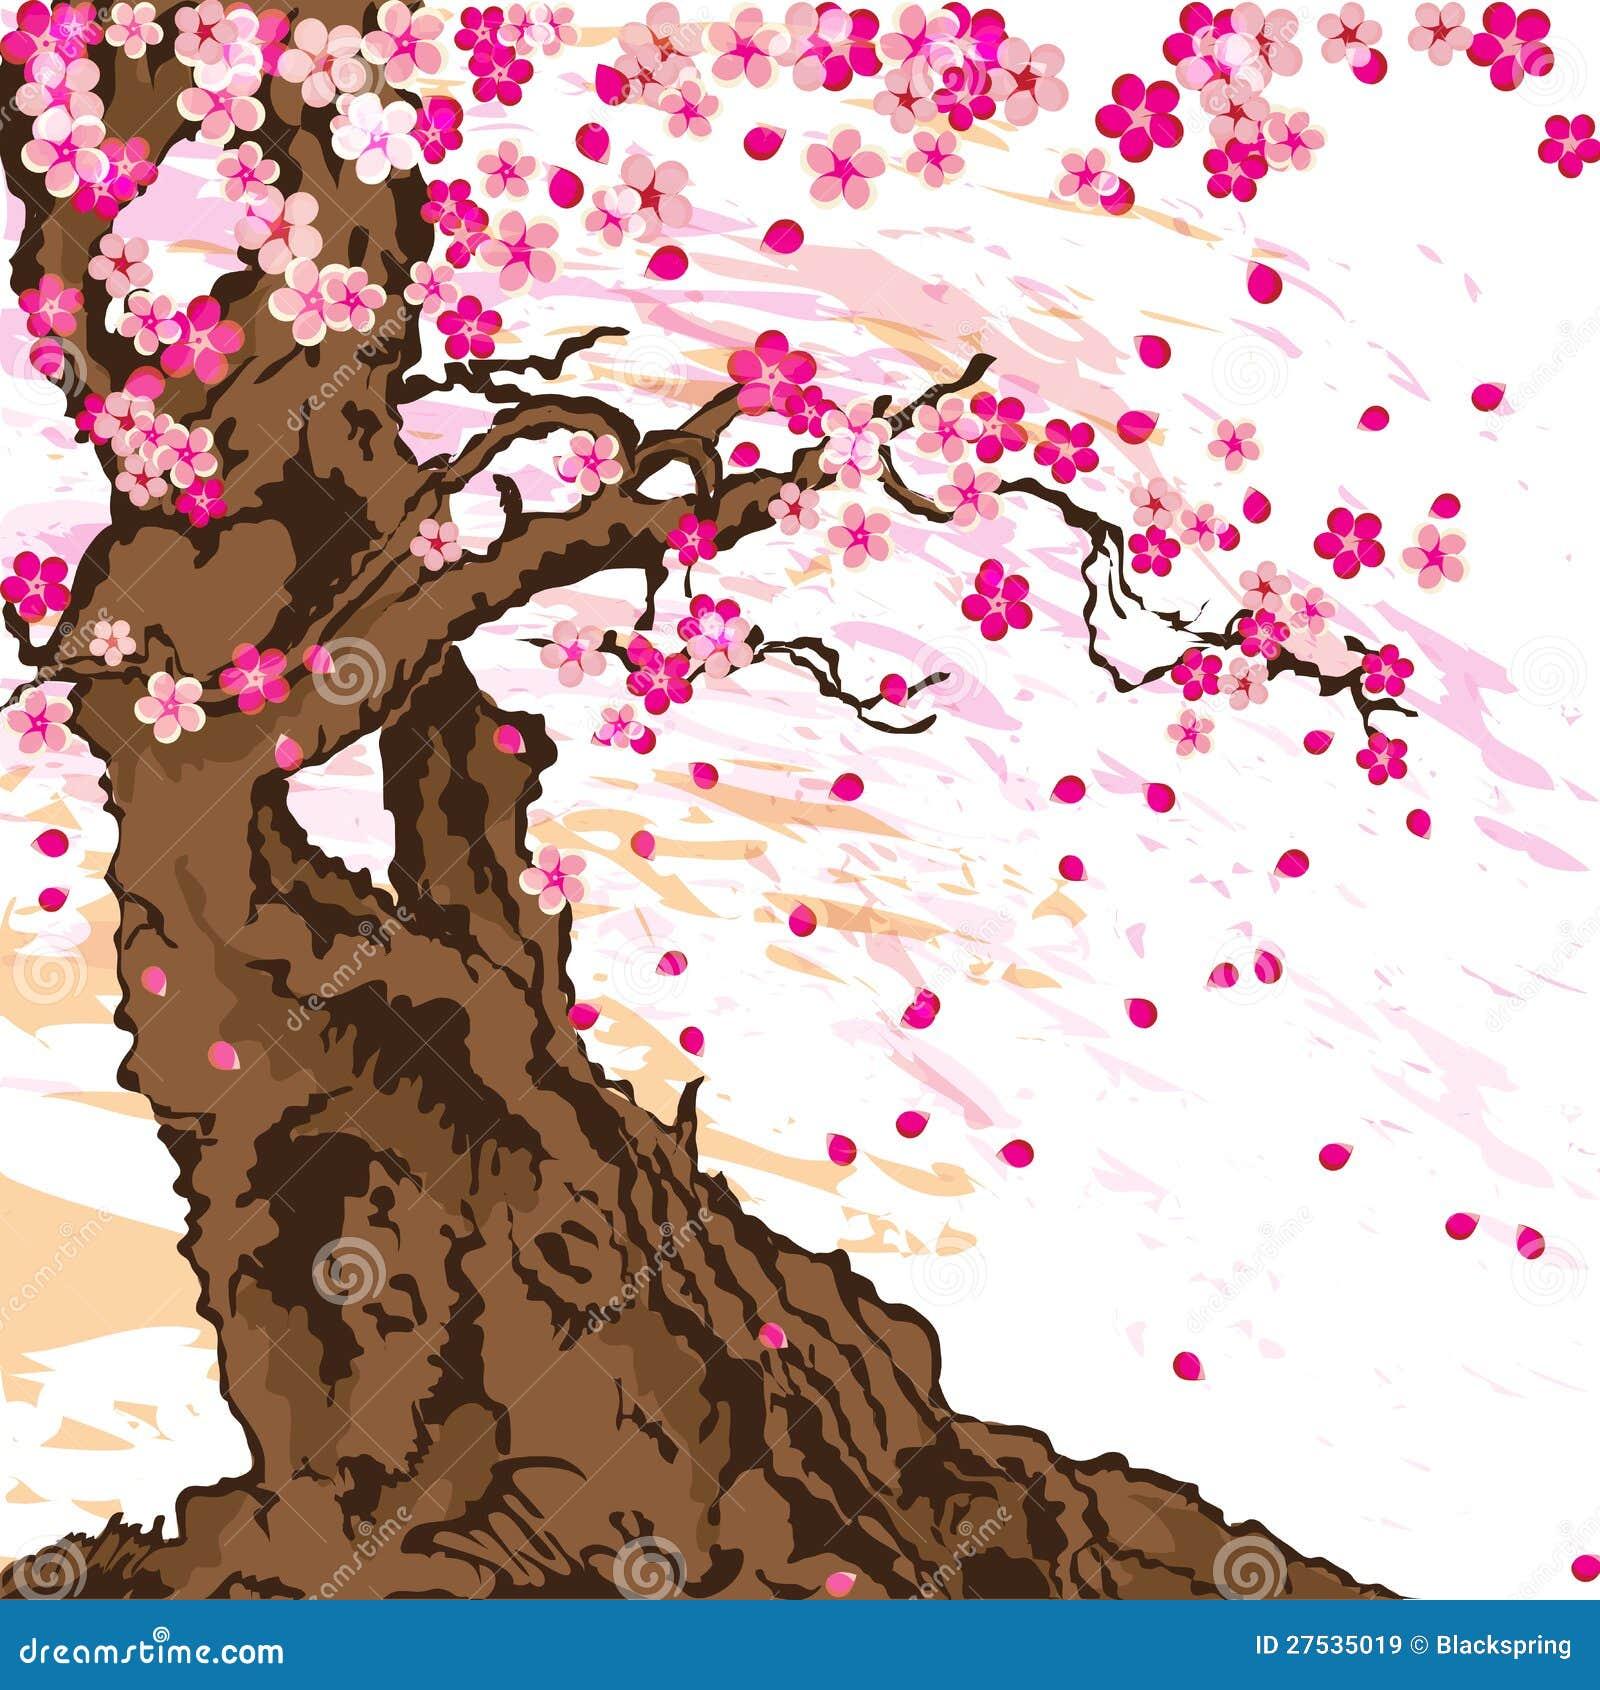 albero di sakura immagini stock libere da diritti On sakura albero